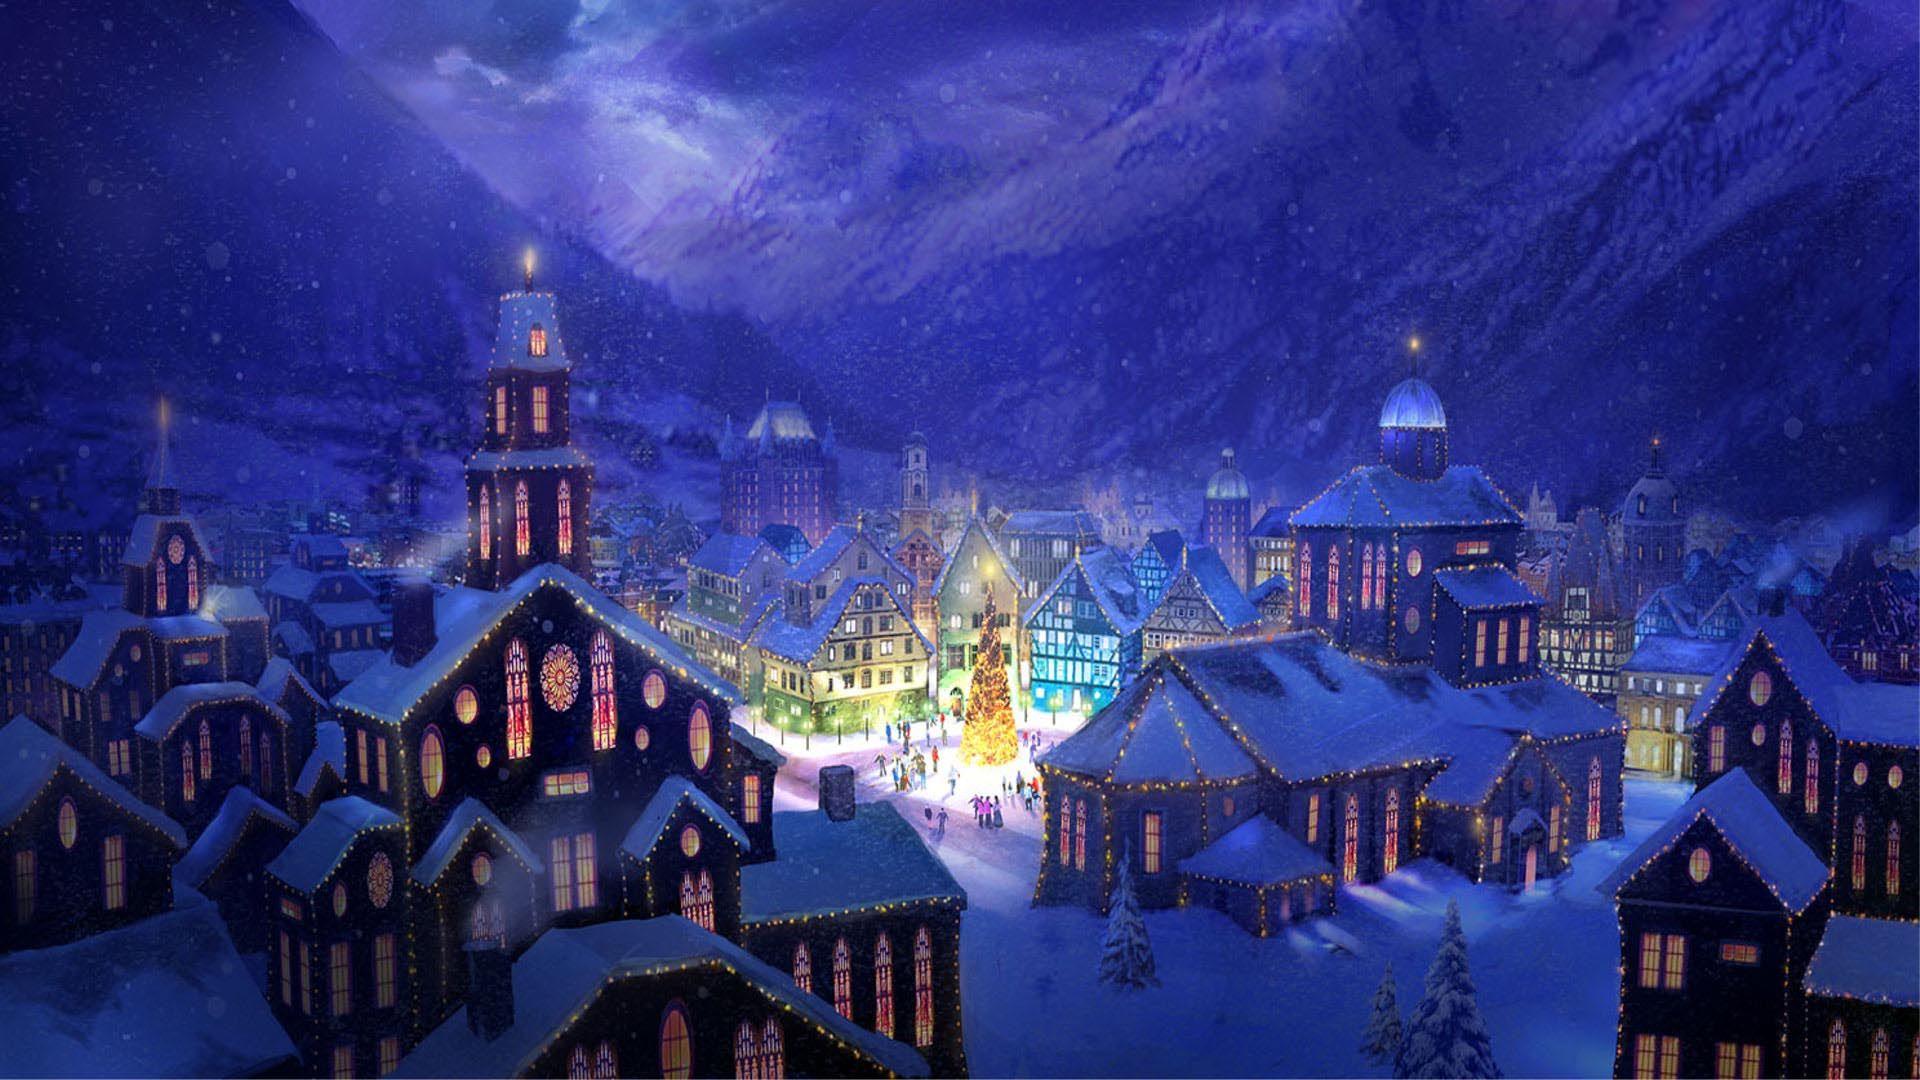 Christmas Village Square Hd Wallpaper Fullhdwpp Full Hd Wallpapers 1920x1080 Christmas Landscape Christmas Wallpaper Hd Christmas Town